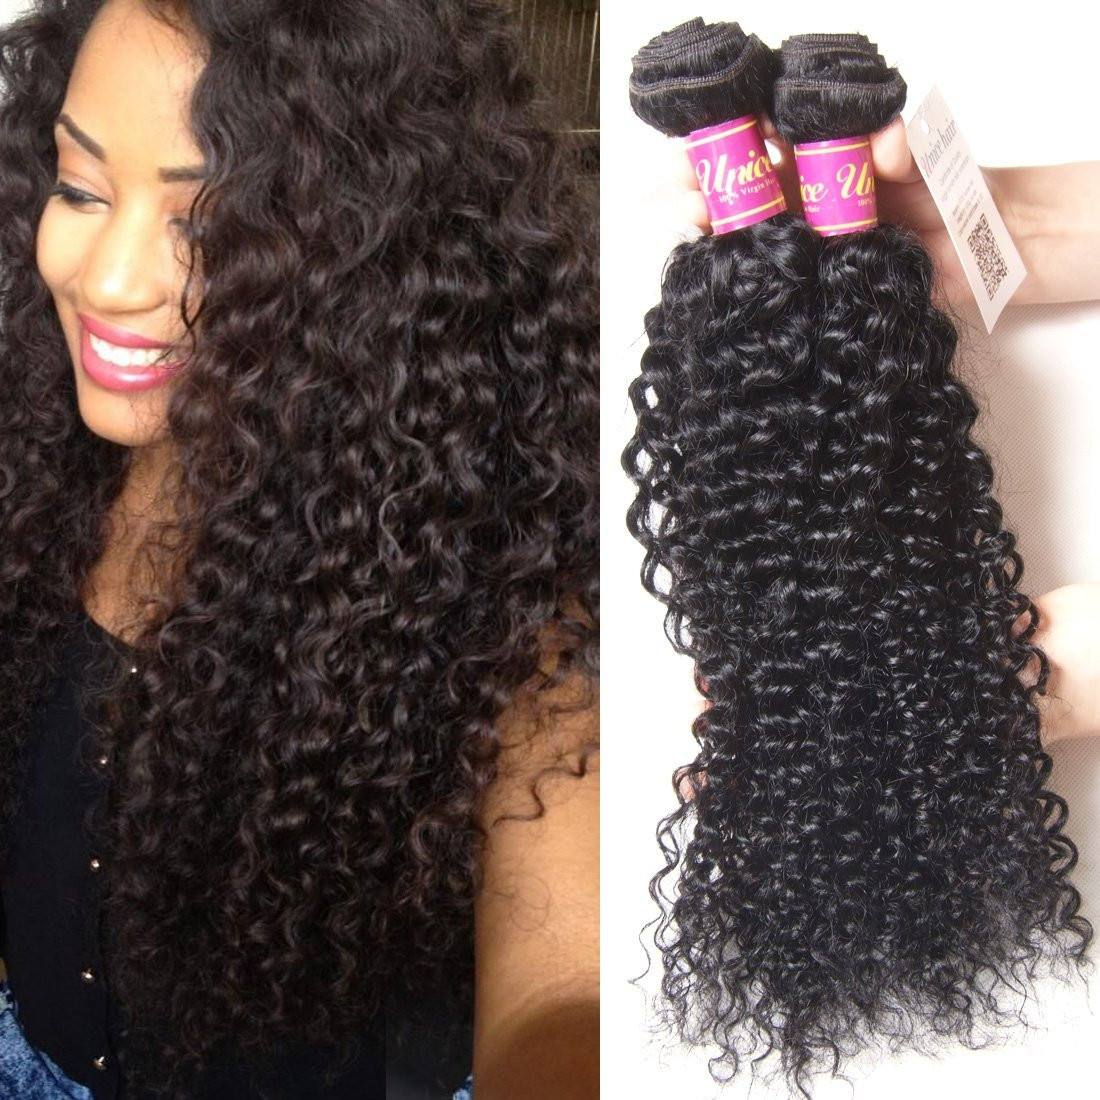 Aplique Cabelo Cacheado Tic Tac Mega Hair